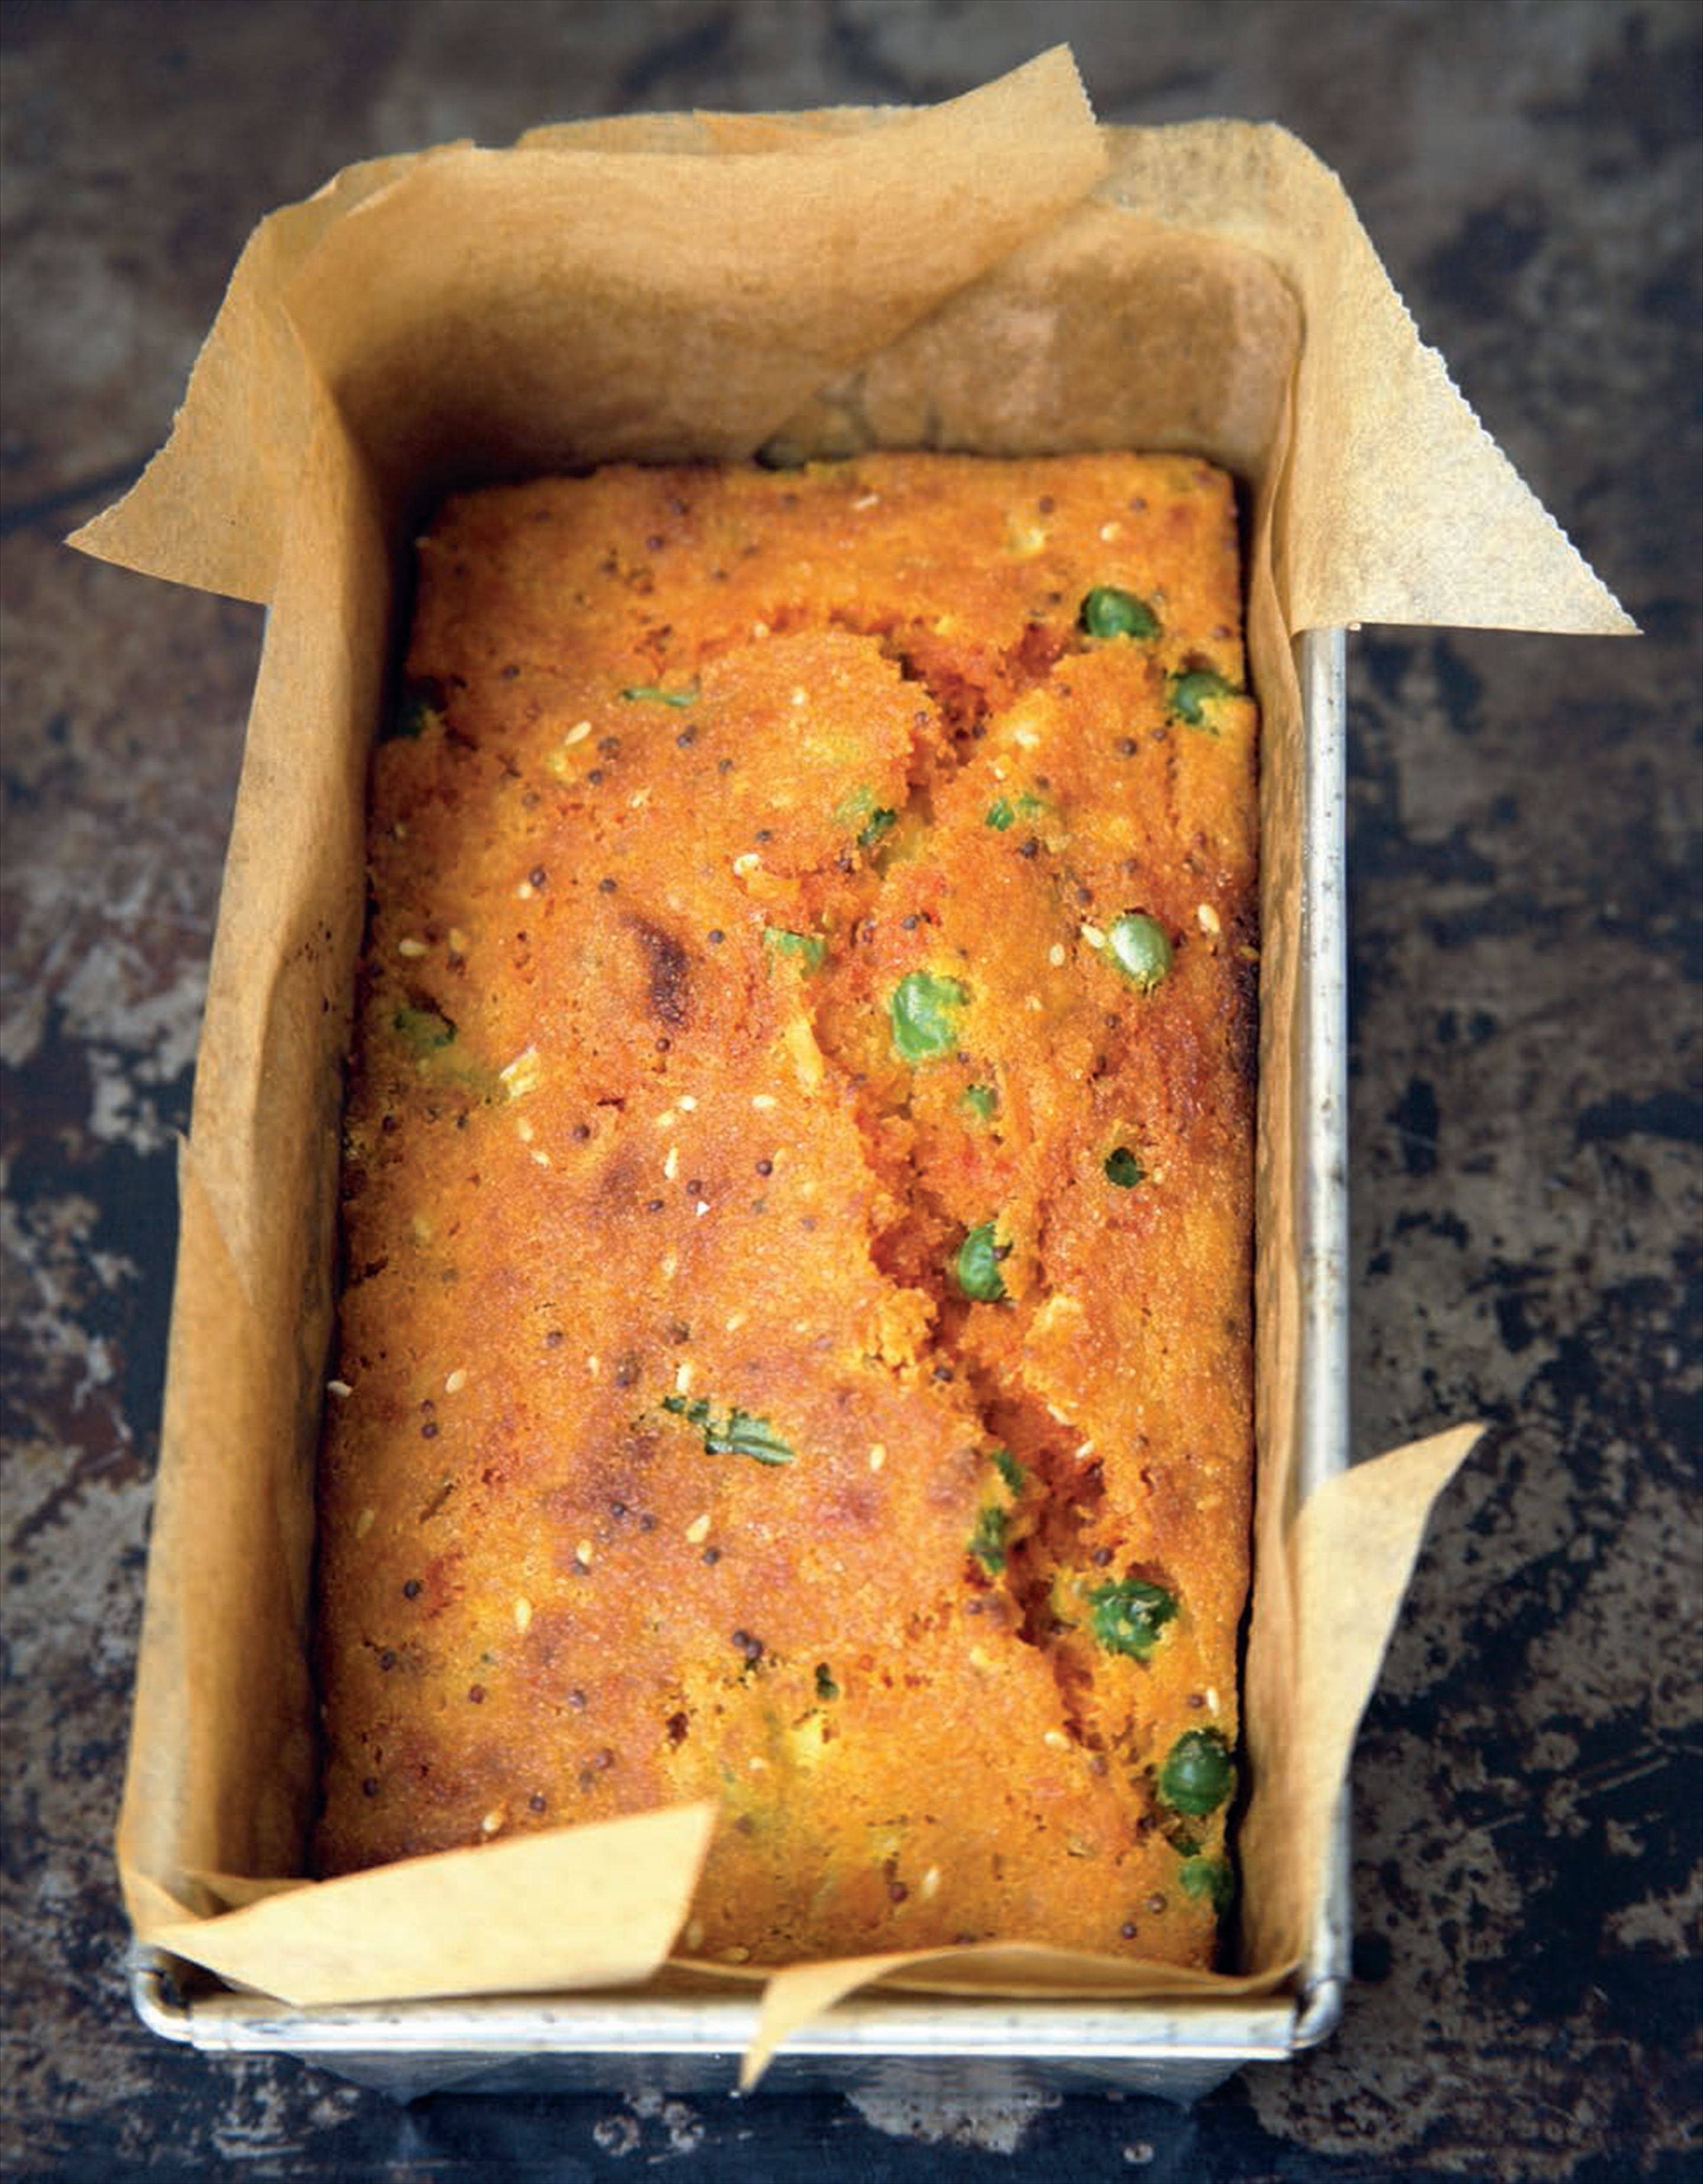 Savoury semolina cake recipe from indian food made easy by anjum savoury semolina cake recipe from indian food made easy by anjum anand cooked forumfinder Images